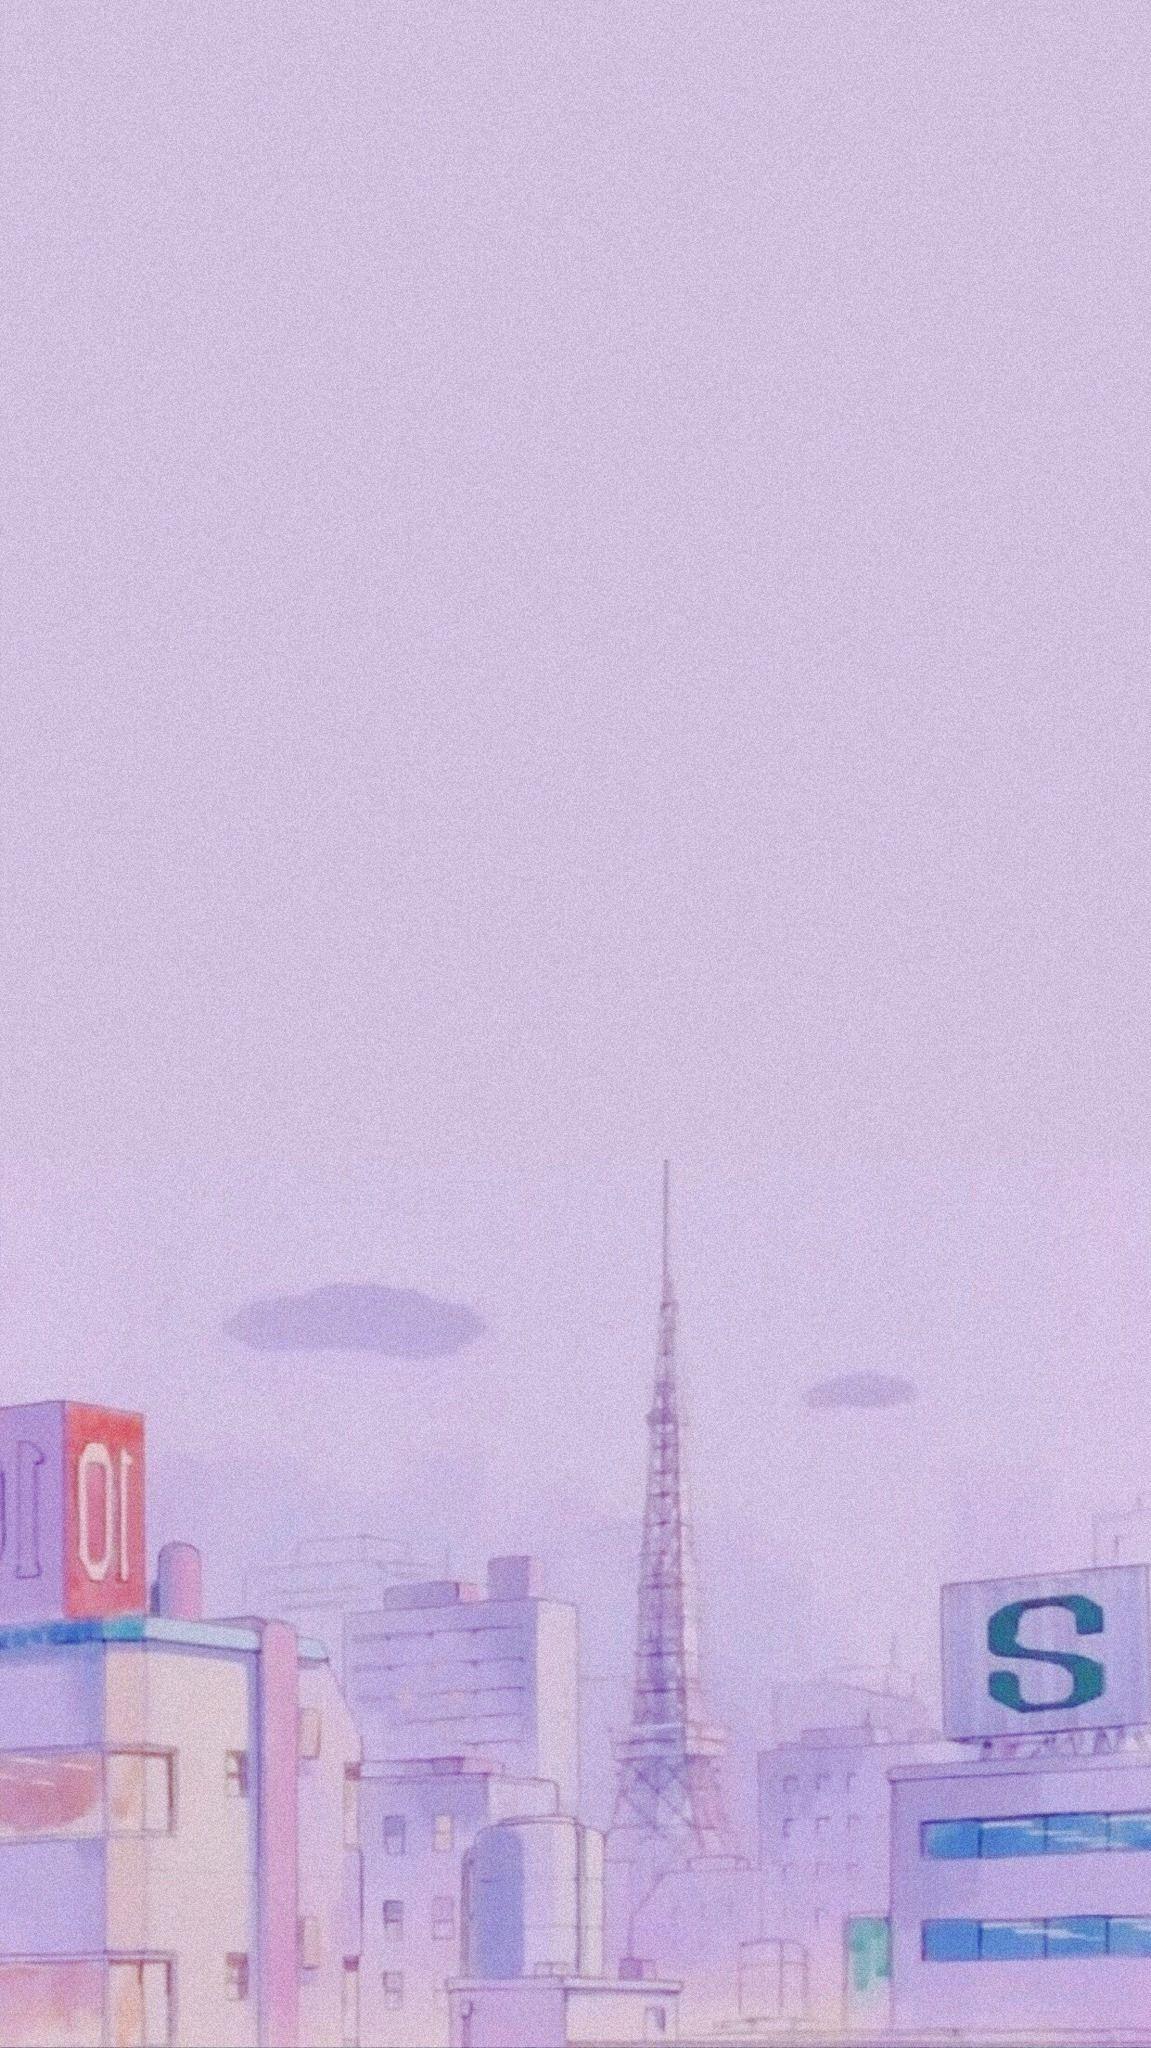 Pin By Amanda Navas On Anime Wall Aesthetic Pastel Wallpaper Purple Wallpaper Iphone Anime Scenery Wallpaper